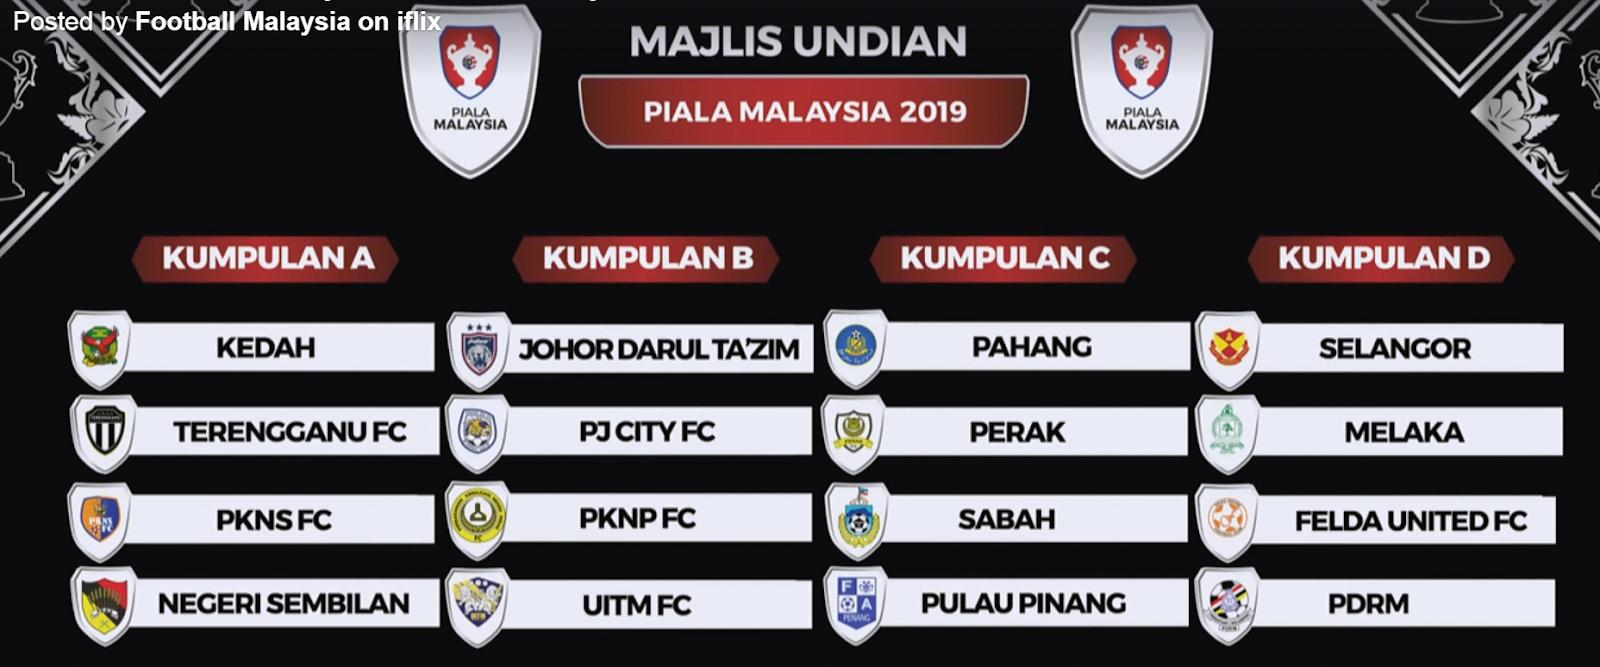 Biaqpila Terkini Keputusan Undian Piala Malaysia 2019